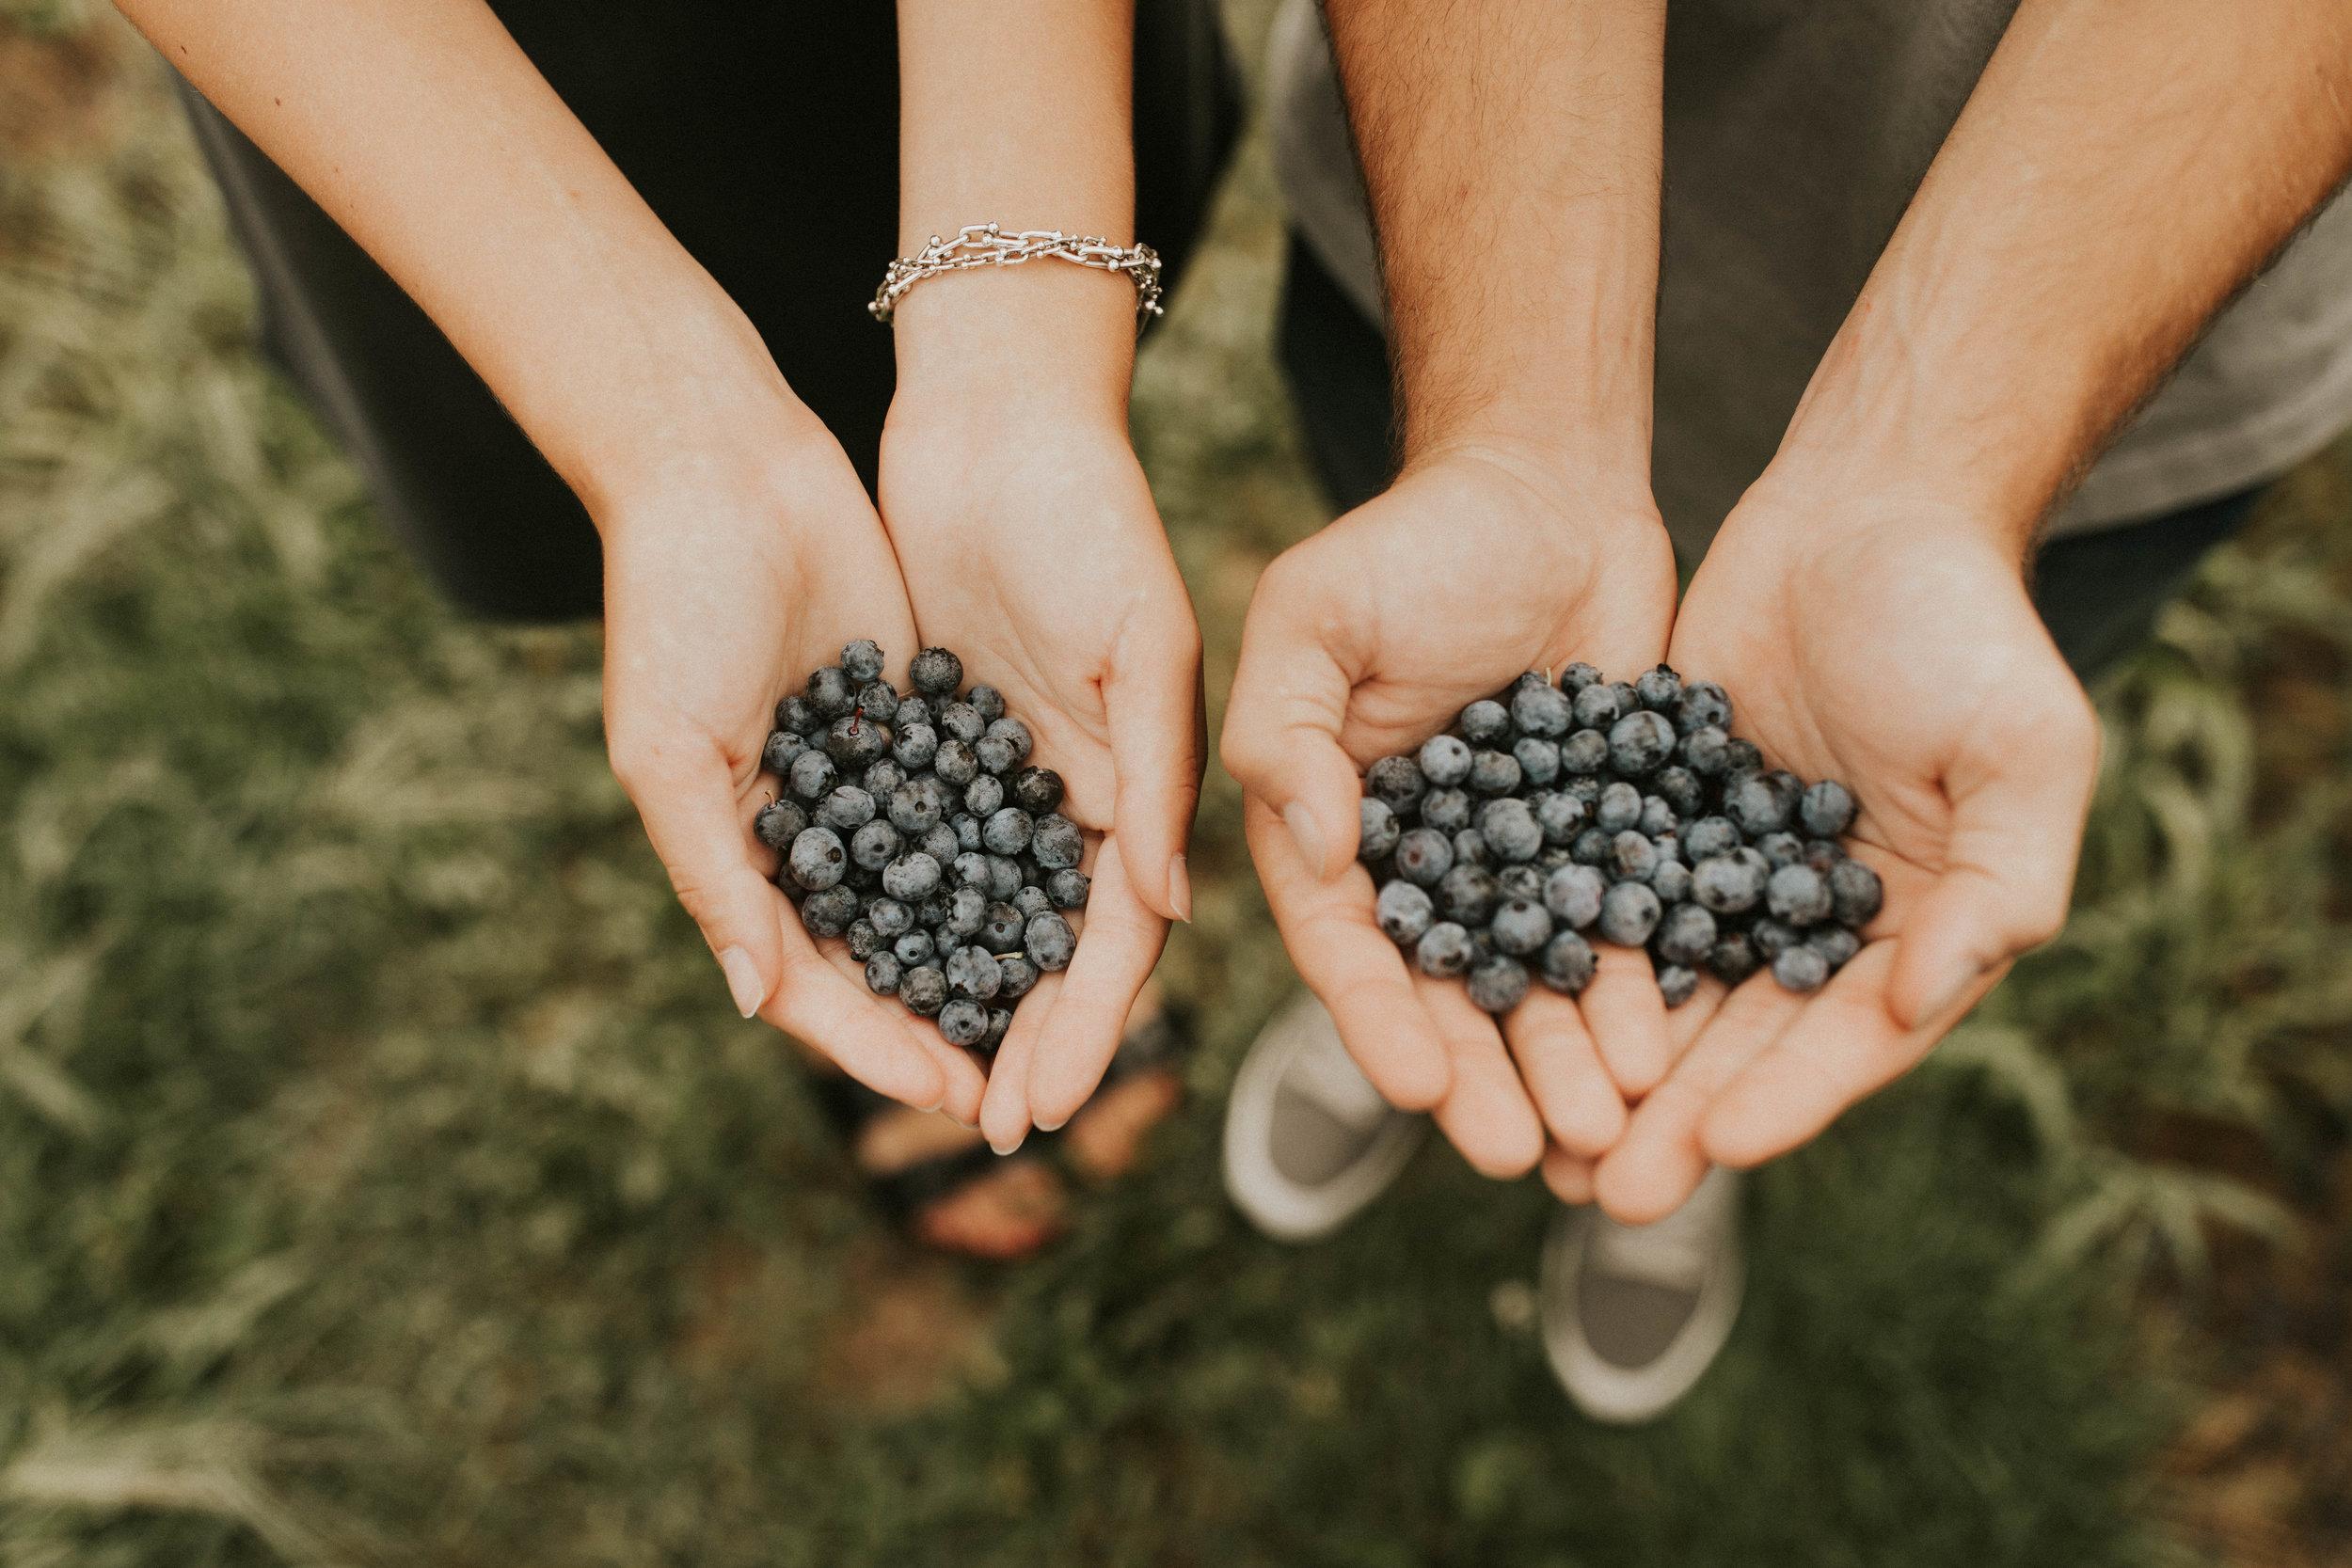 blueberry field photoshoot